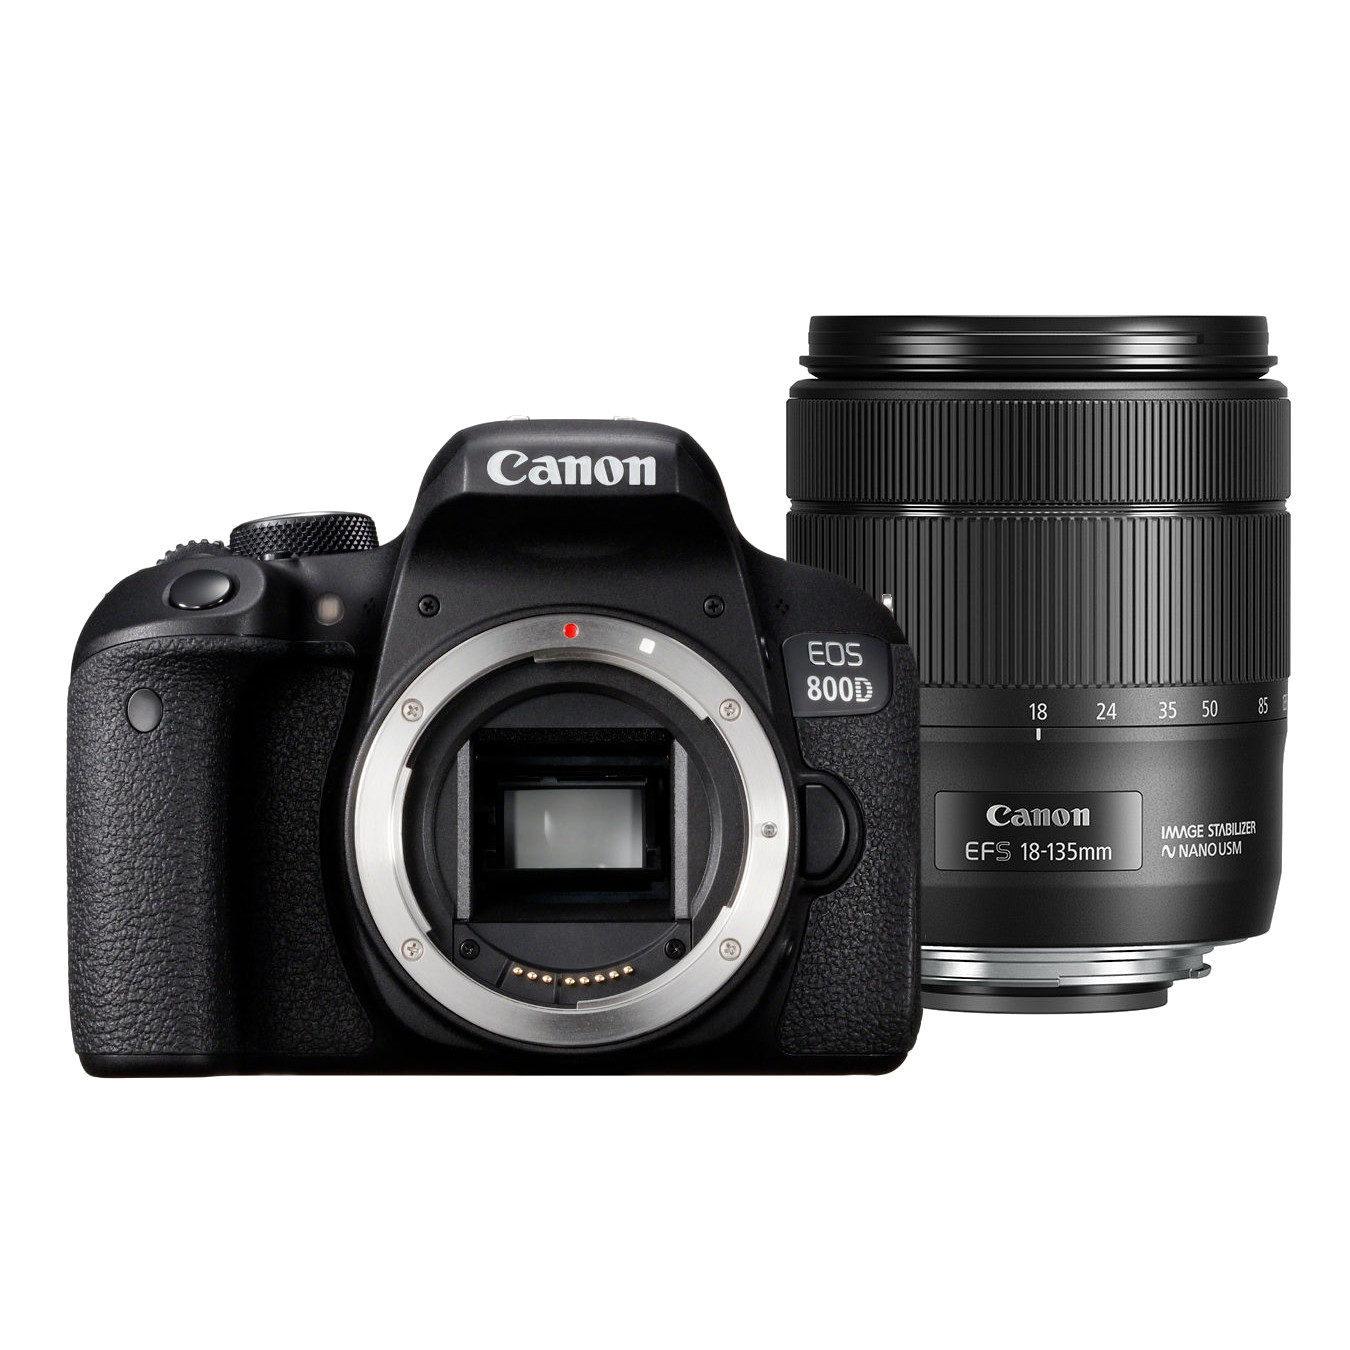 Canon EOS 800D DSLR + 18-135 IS STM <br/>€ 889.00 <br/> <a href='https://www.cameranu.nl/fotografie/?tt=12190_474631_241358_&r=https%3A%2F%2Fwww.cameranu.nl%2Fnl%2Fp1583235%2Fcanon-eos-800d-dslr-18-135-is-stm%3Fchannable%3De10841.MTU4MzIzNQ%26utm_campaign%3D%26utm_content%3DEOS%2Bspiegelreflex%26utm_source%3DTradetracker%26utm_medium%3Dcpc%26utm_term%3DDigitale%2Bcamera%26apos%3Bs' target='_blank'>naar de winkel</a>